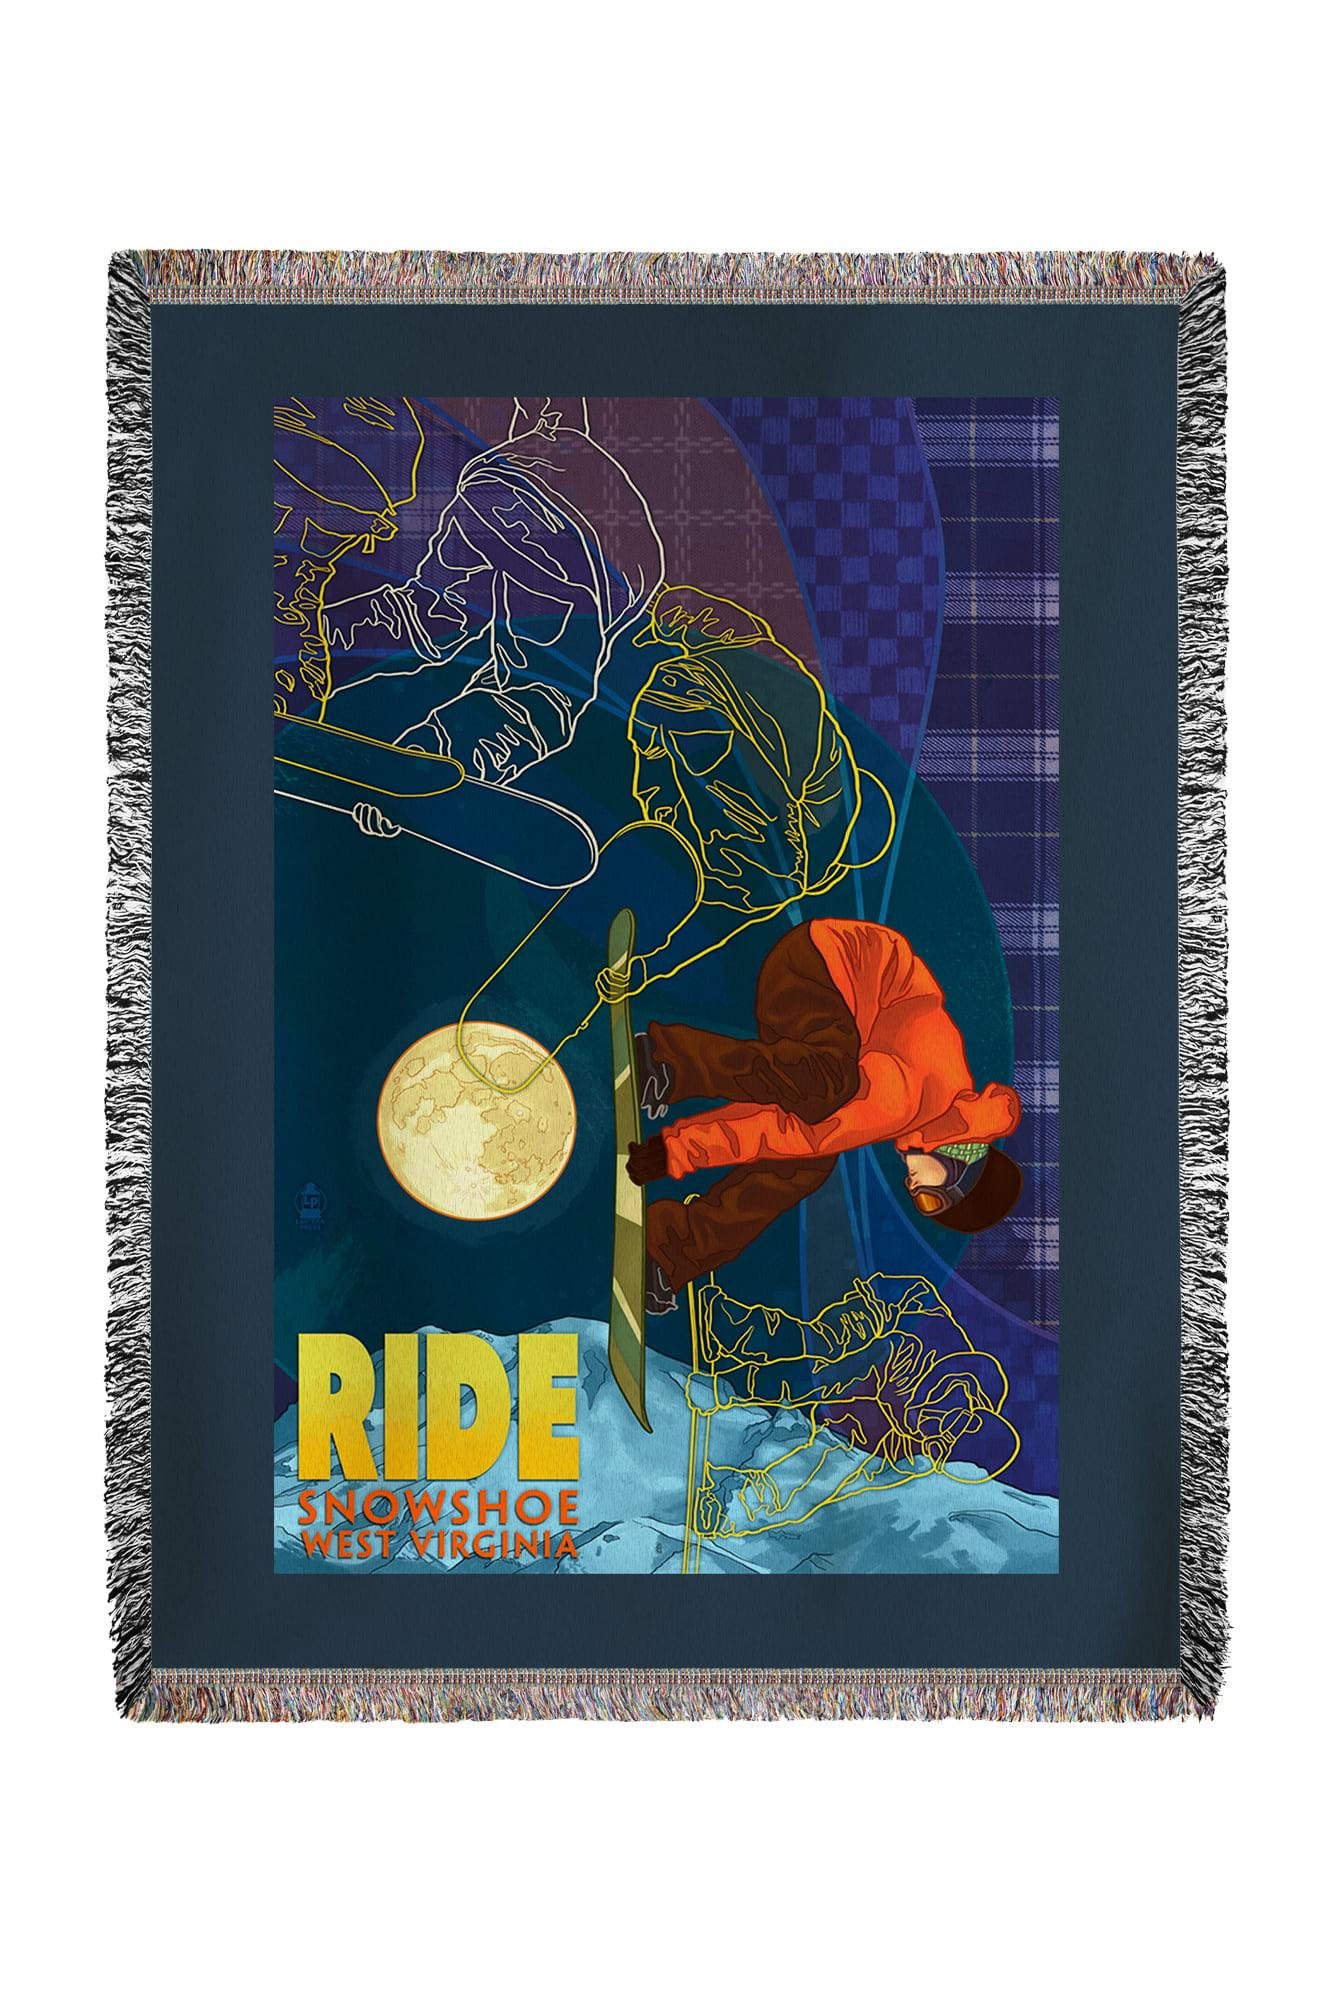 Snowshoe, West Virginia Timelapse Snowboarder Lantern Press Poster (60x80 Woven Chenille Yarn Blanket) by Lantern Press